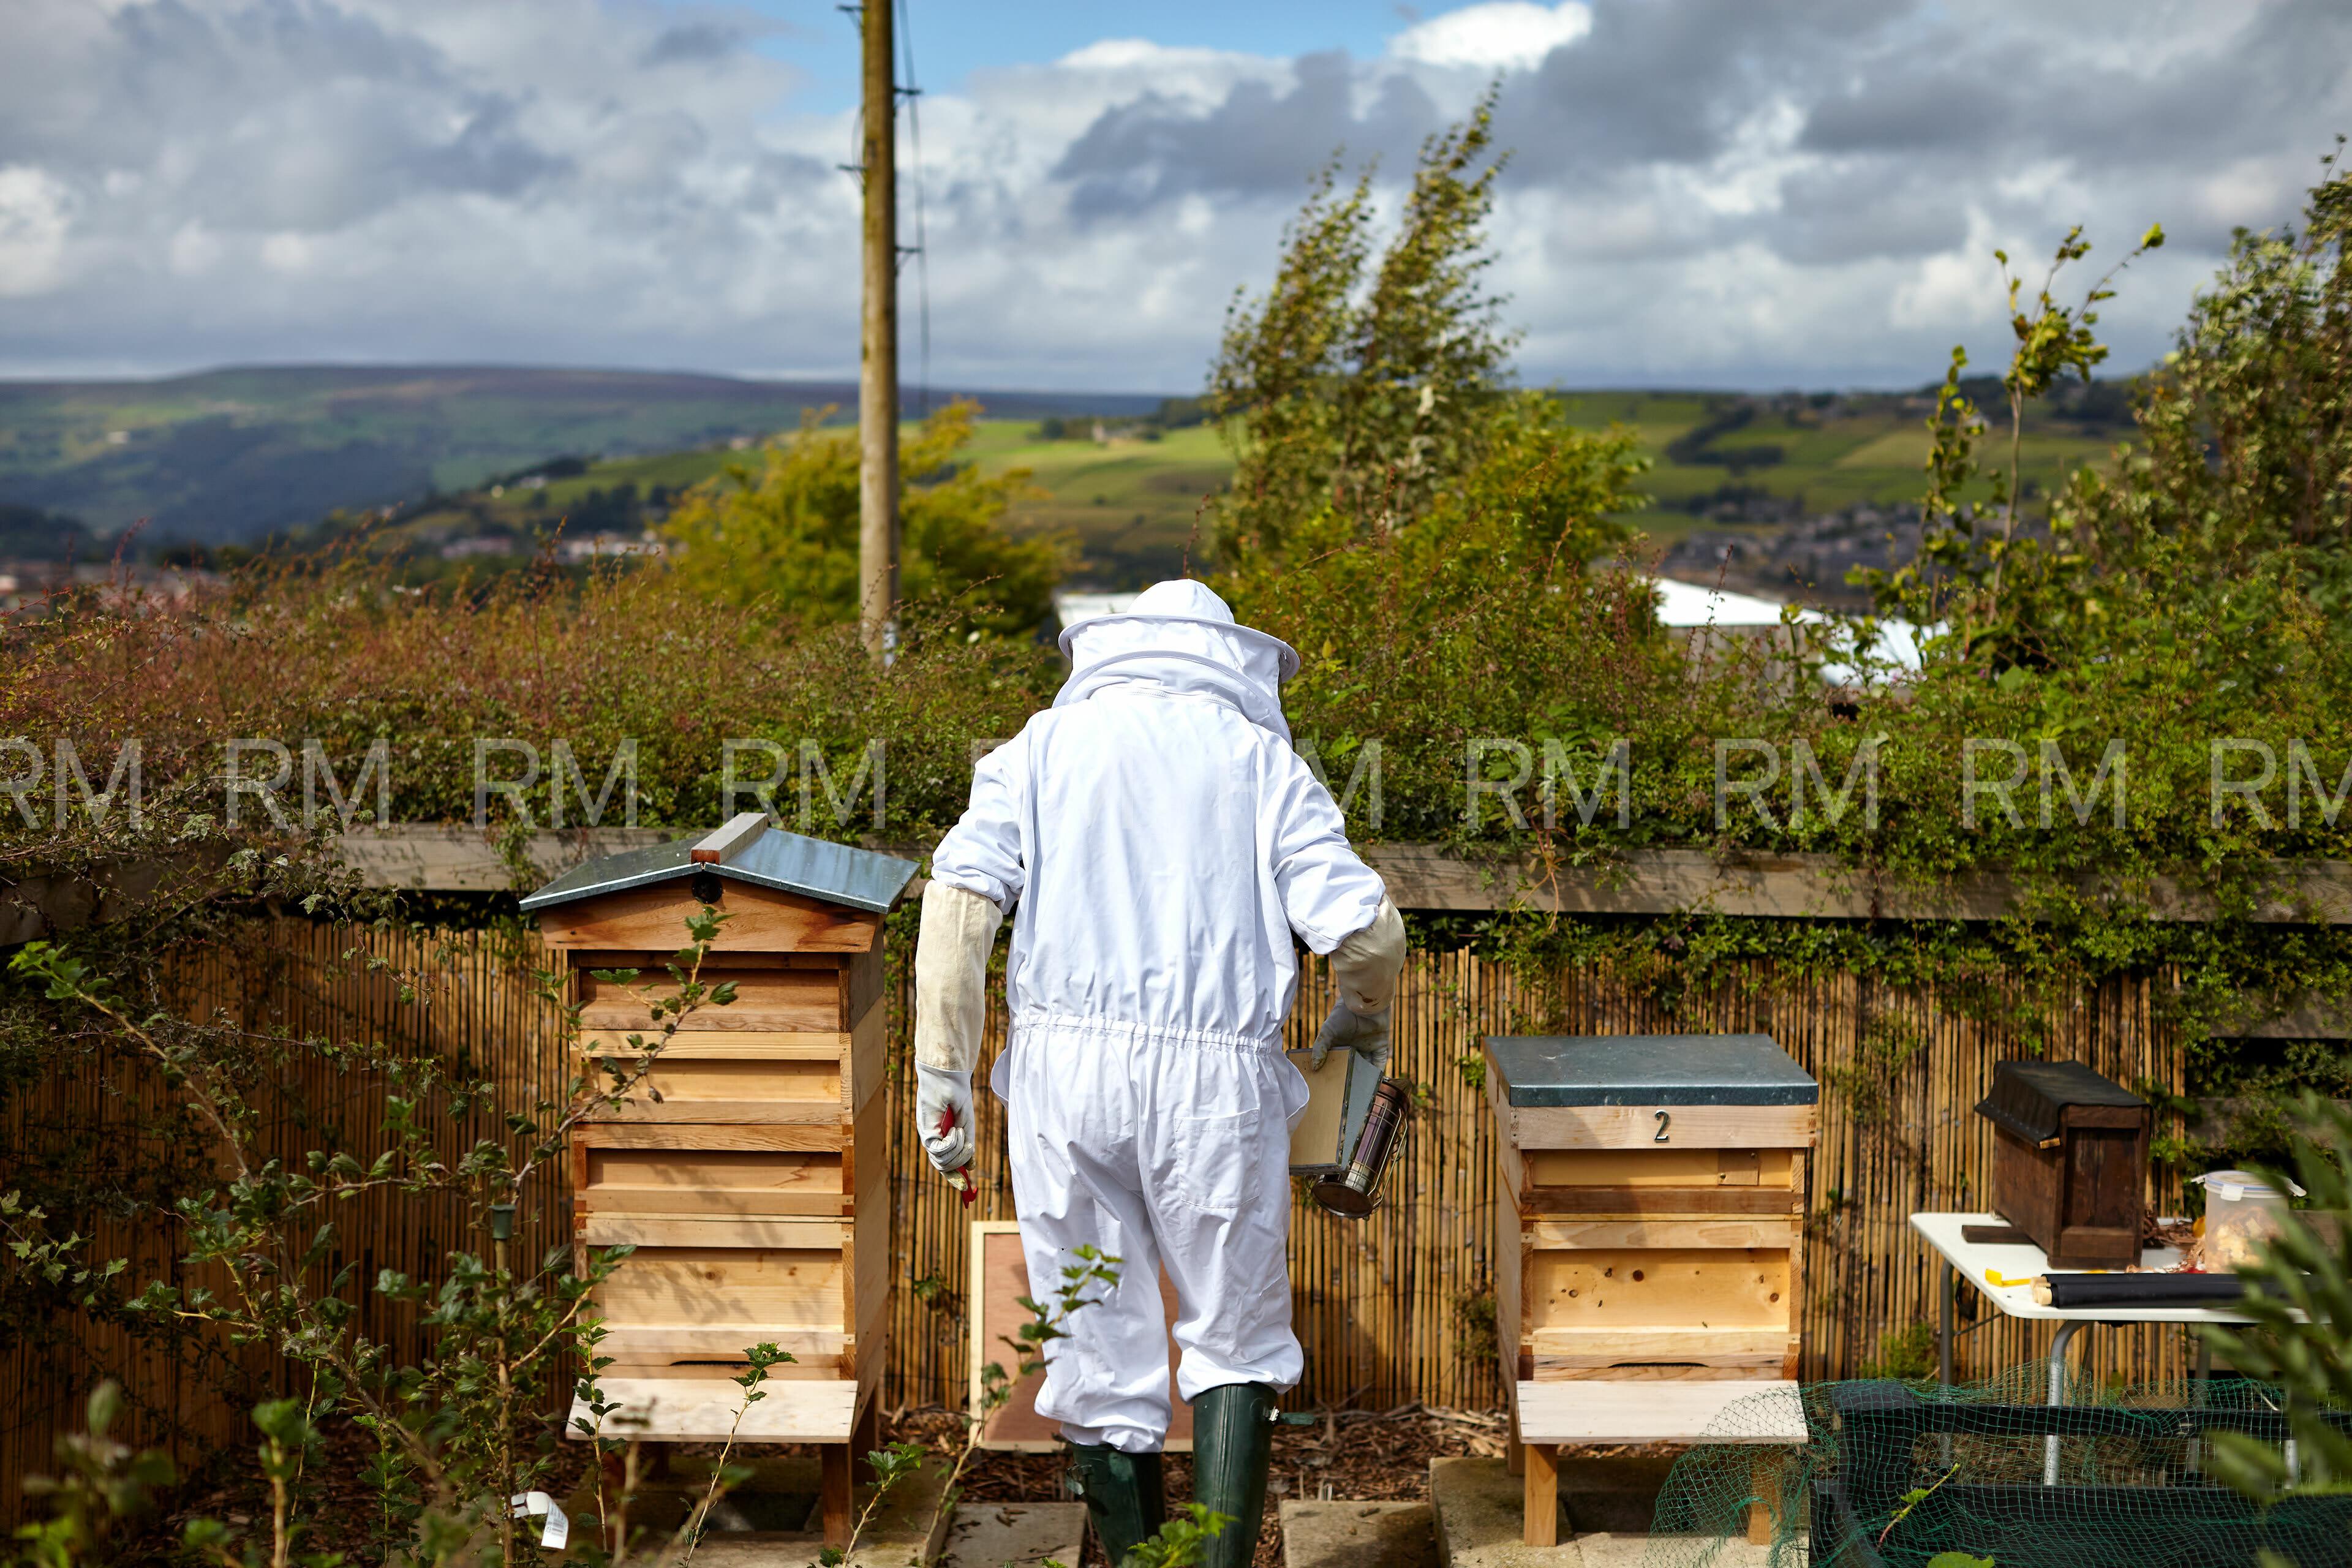 Richard Moran Bees 001